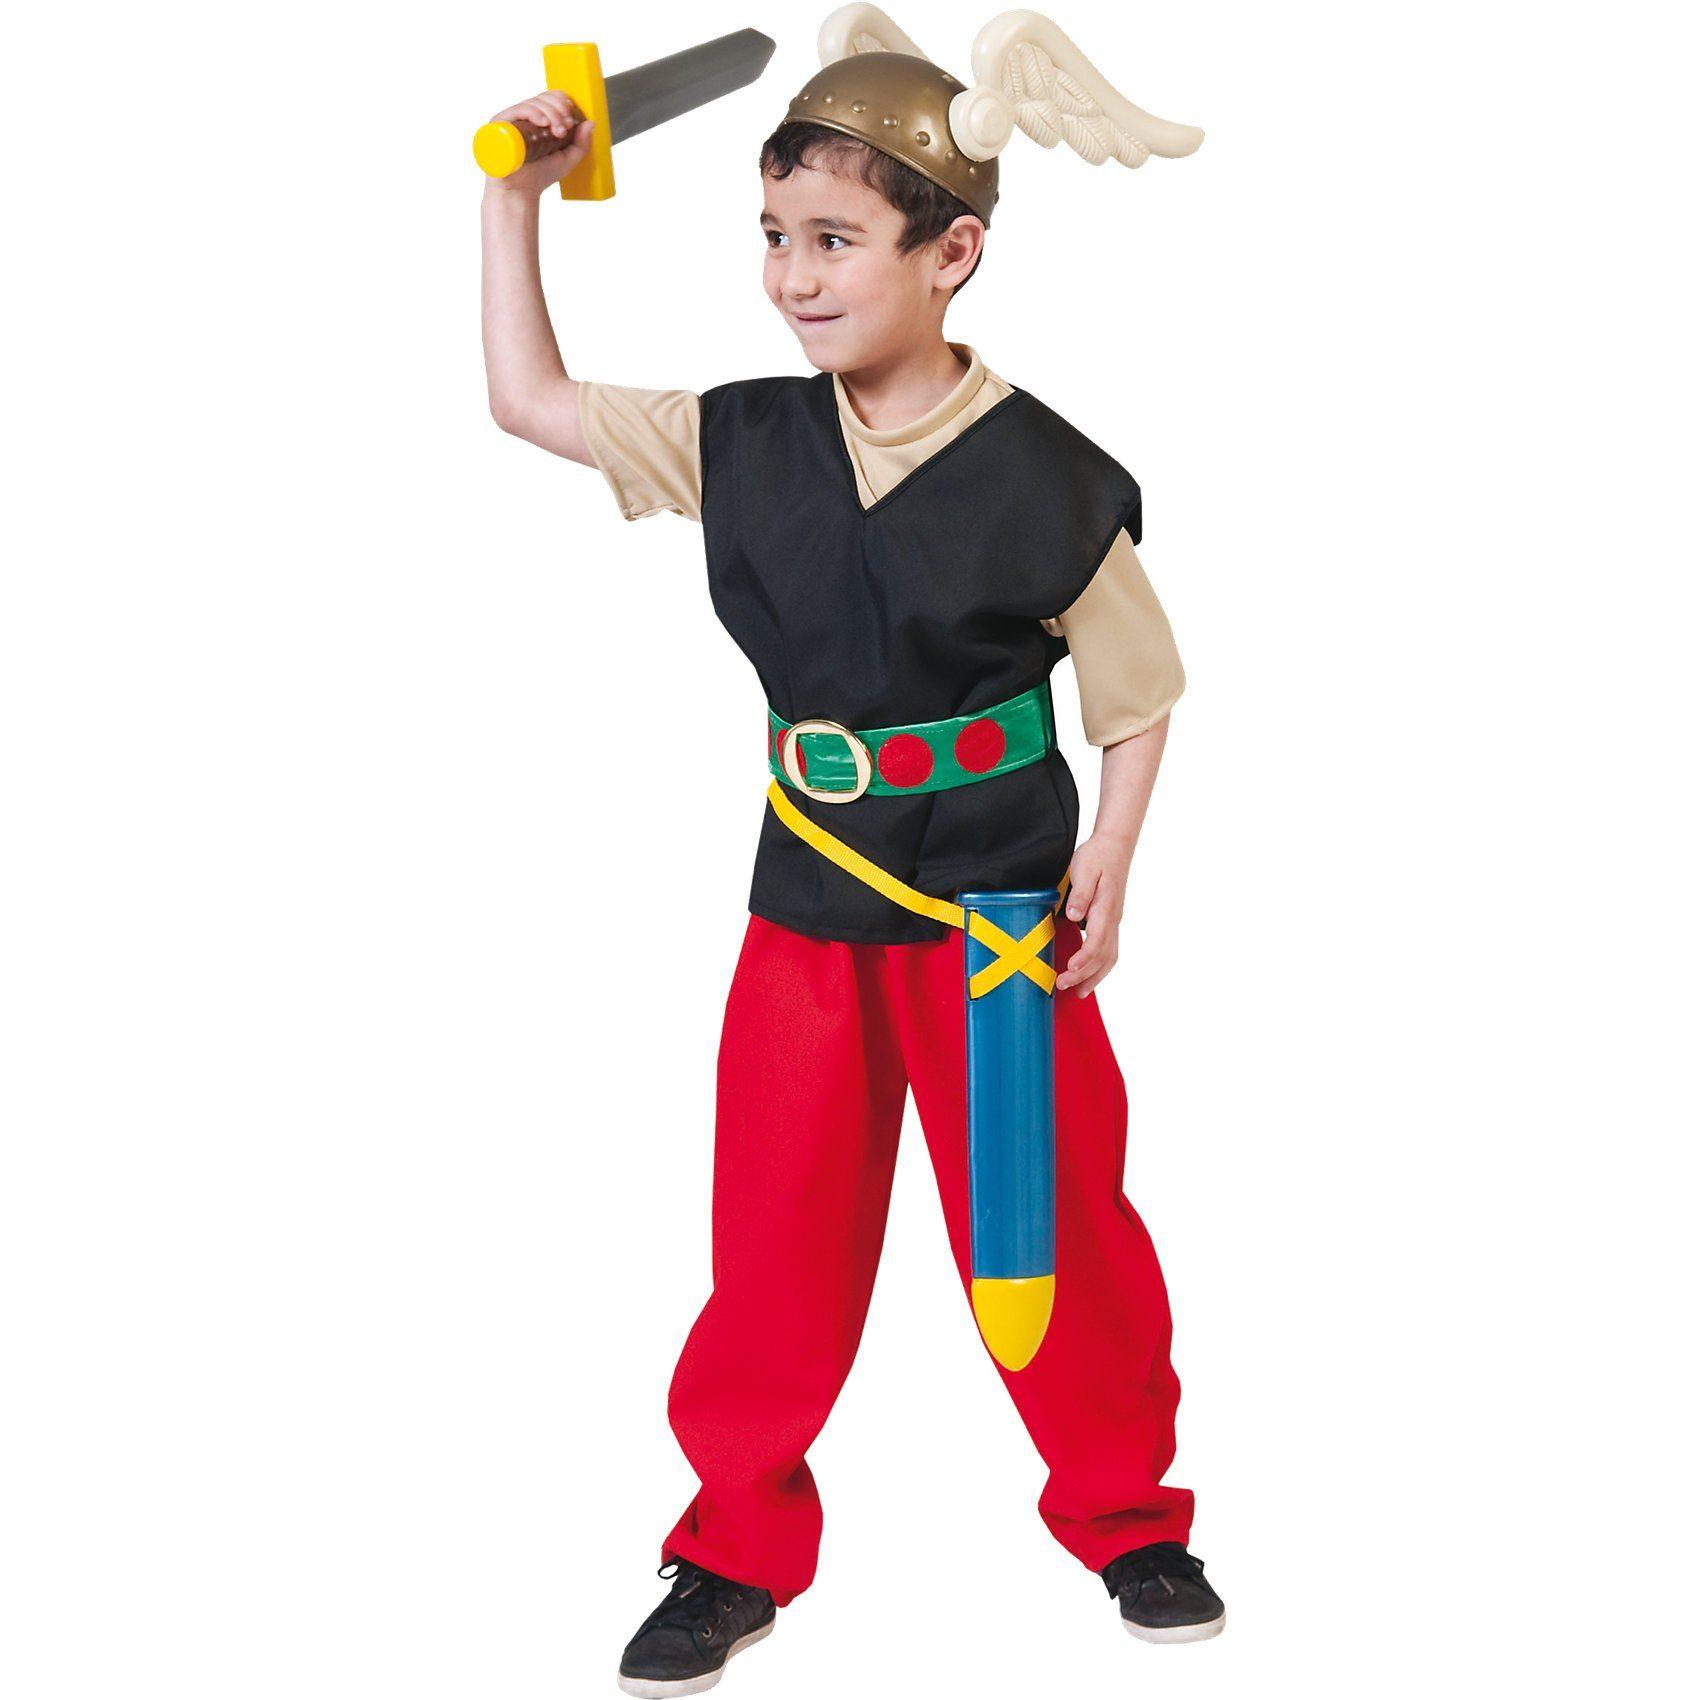 Funny Fashion Kostüm Asterix